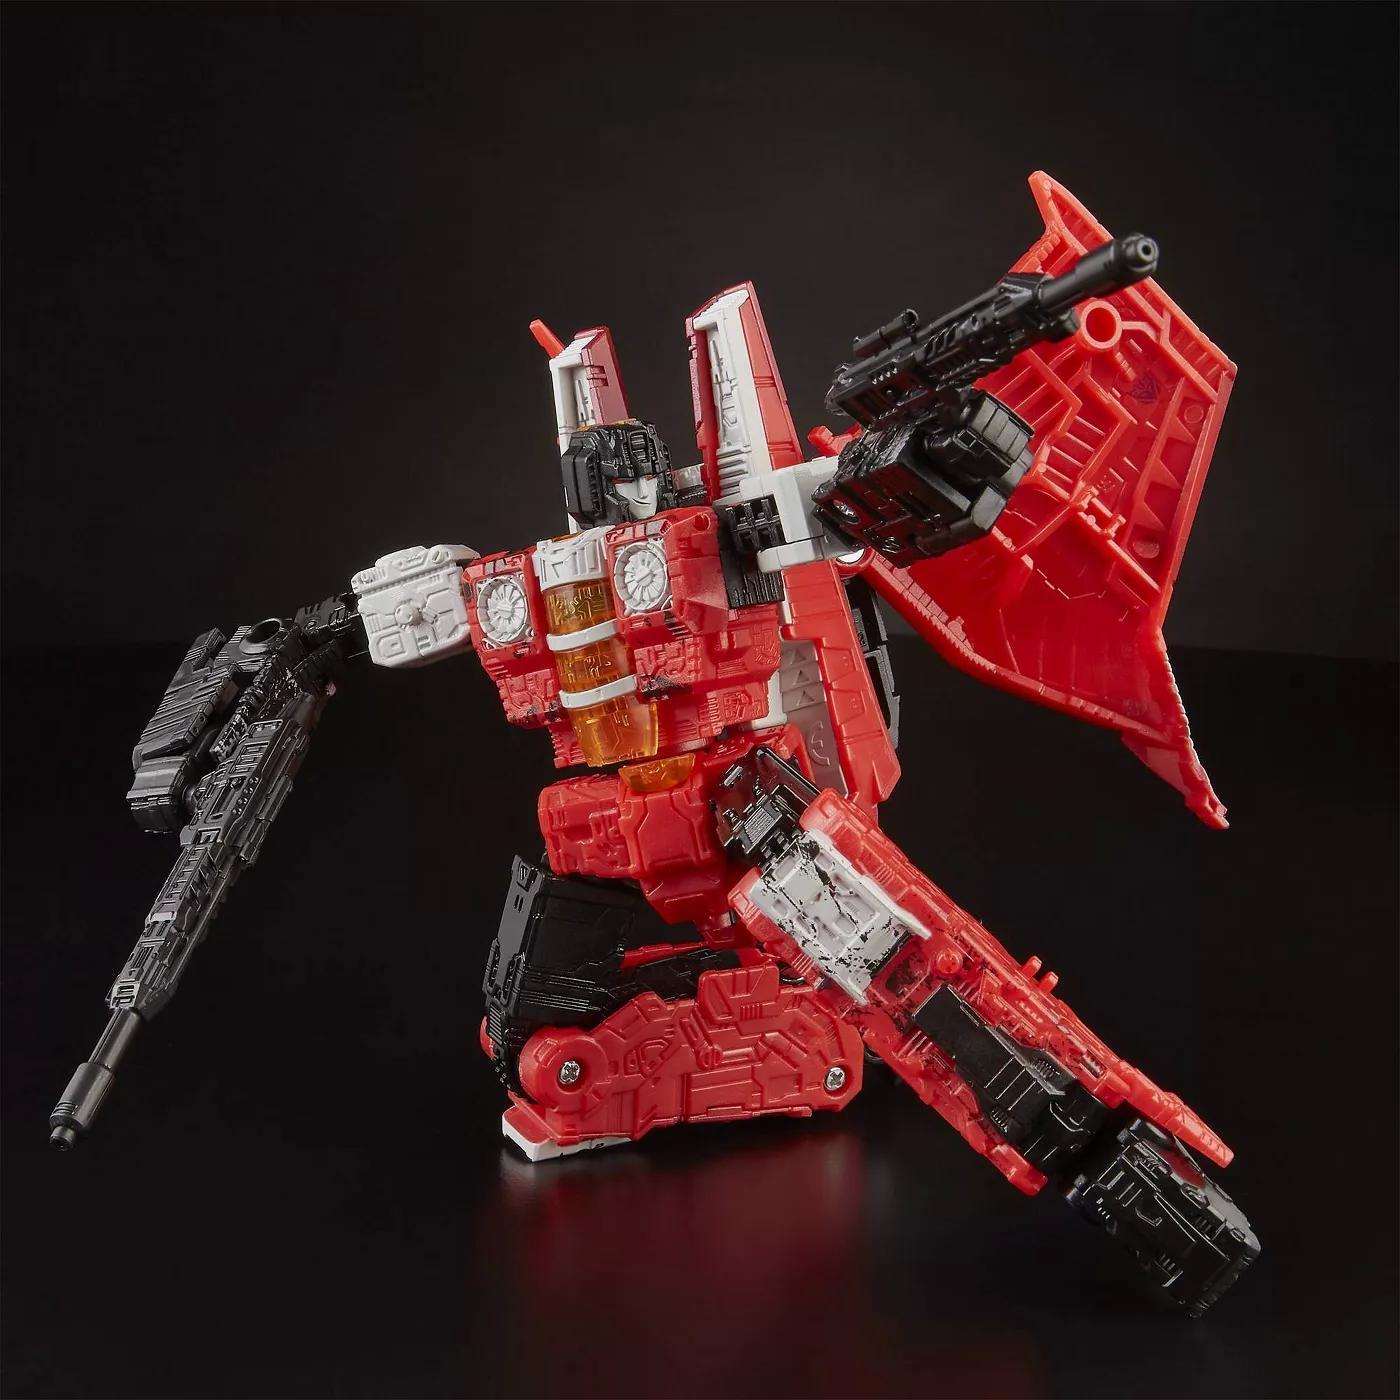 Transformers War WFC-GS02 Voyager Hasbro